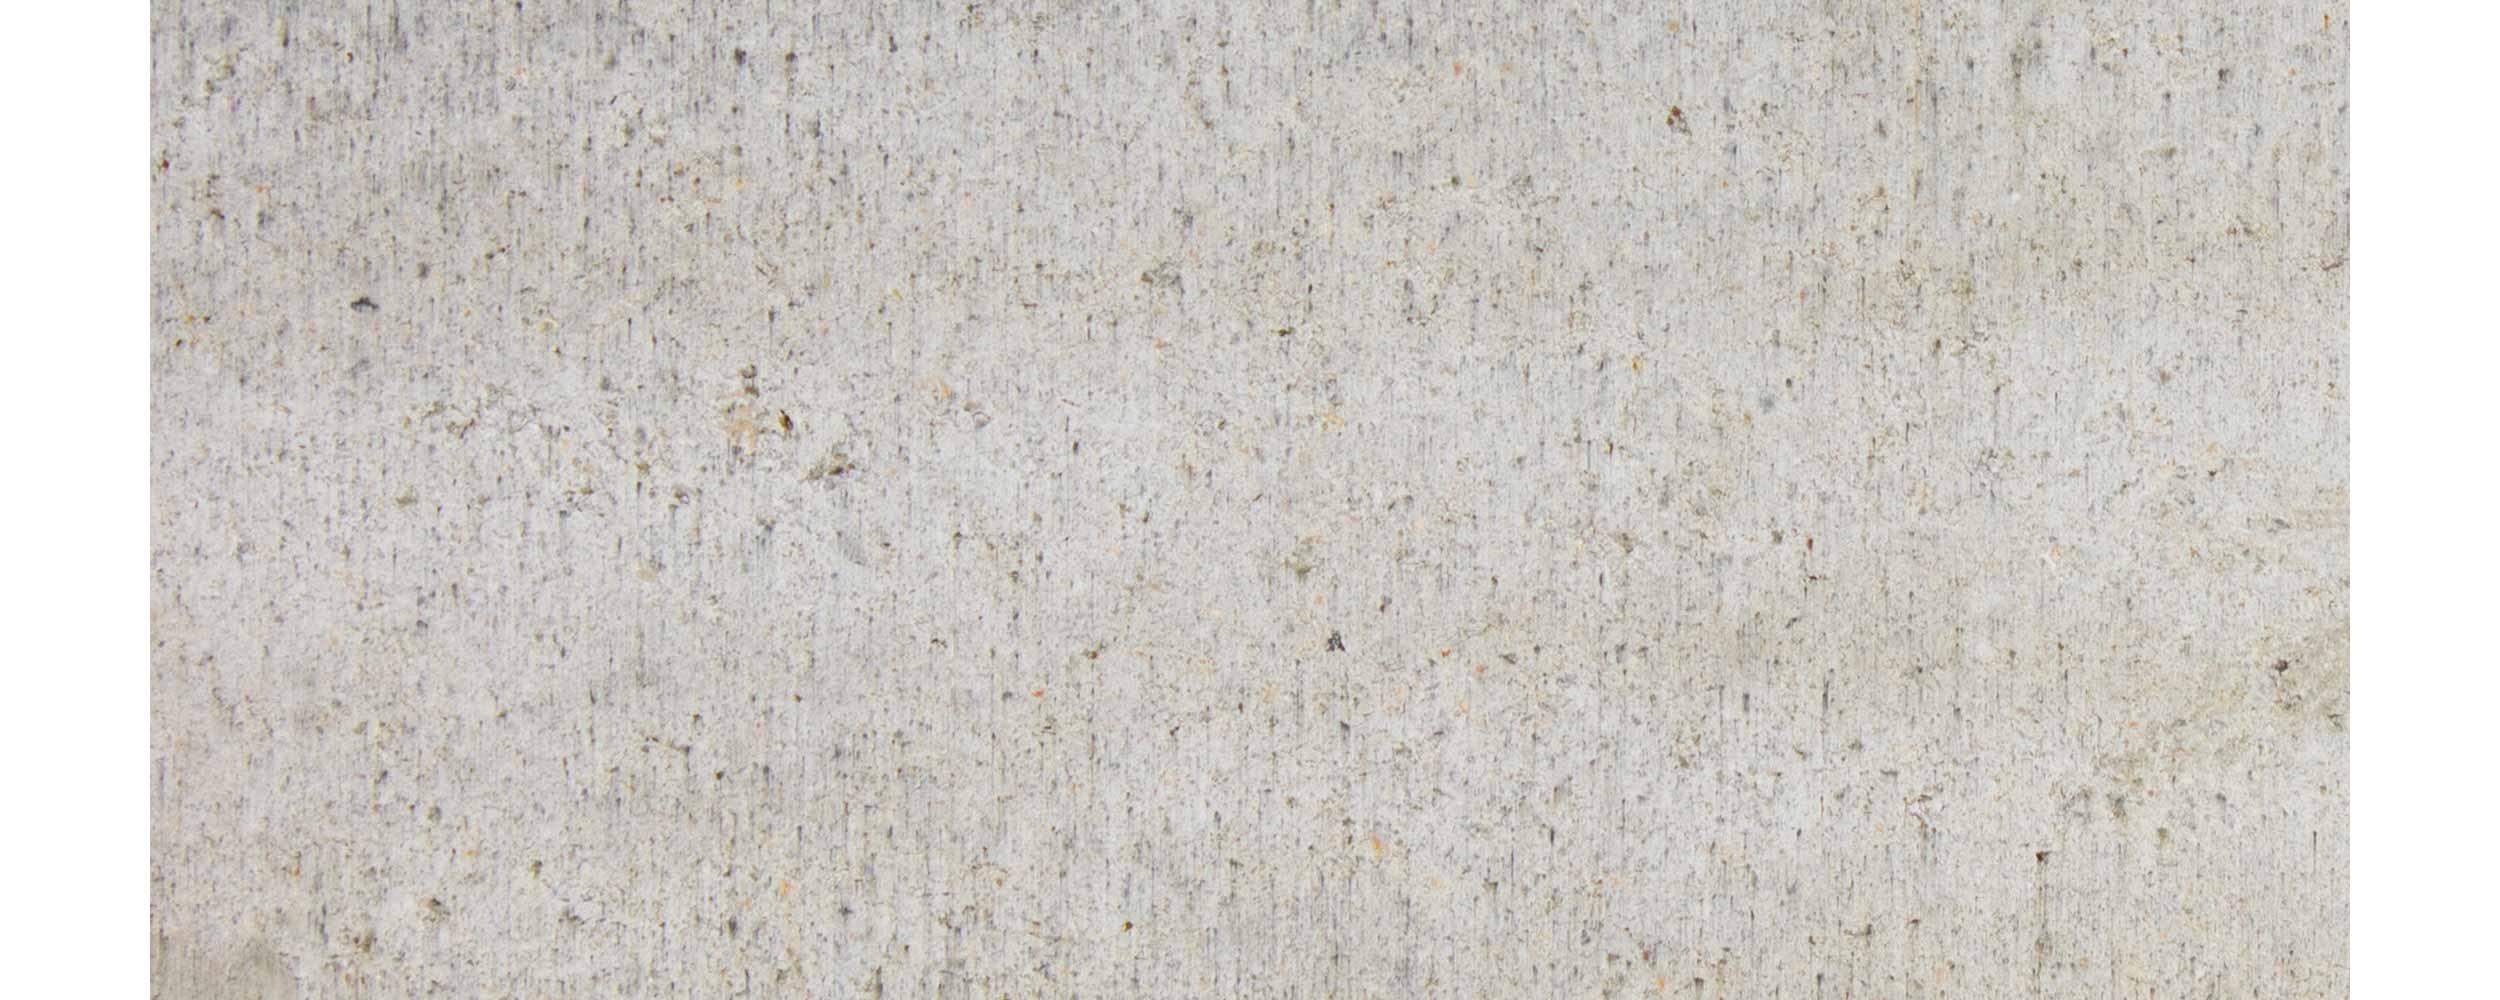 Watershed-Materials-White-Watershed-Block-1-2500.jpg